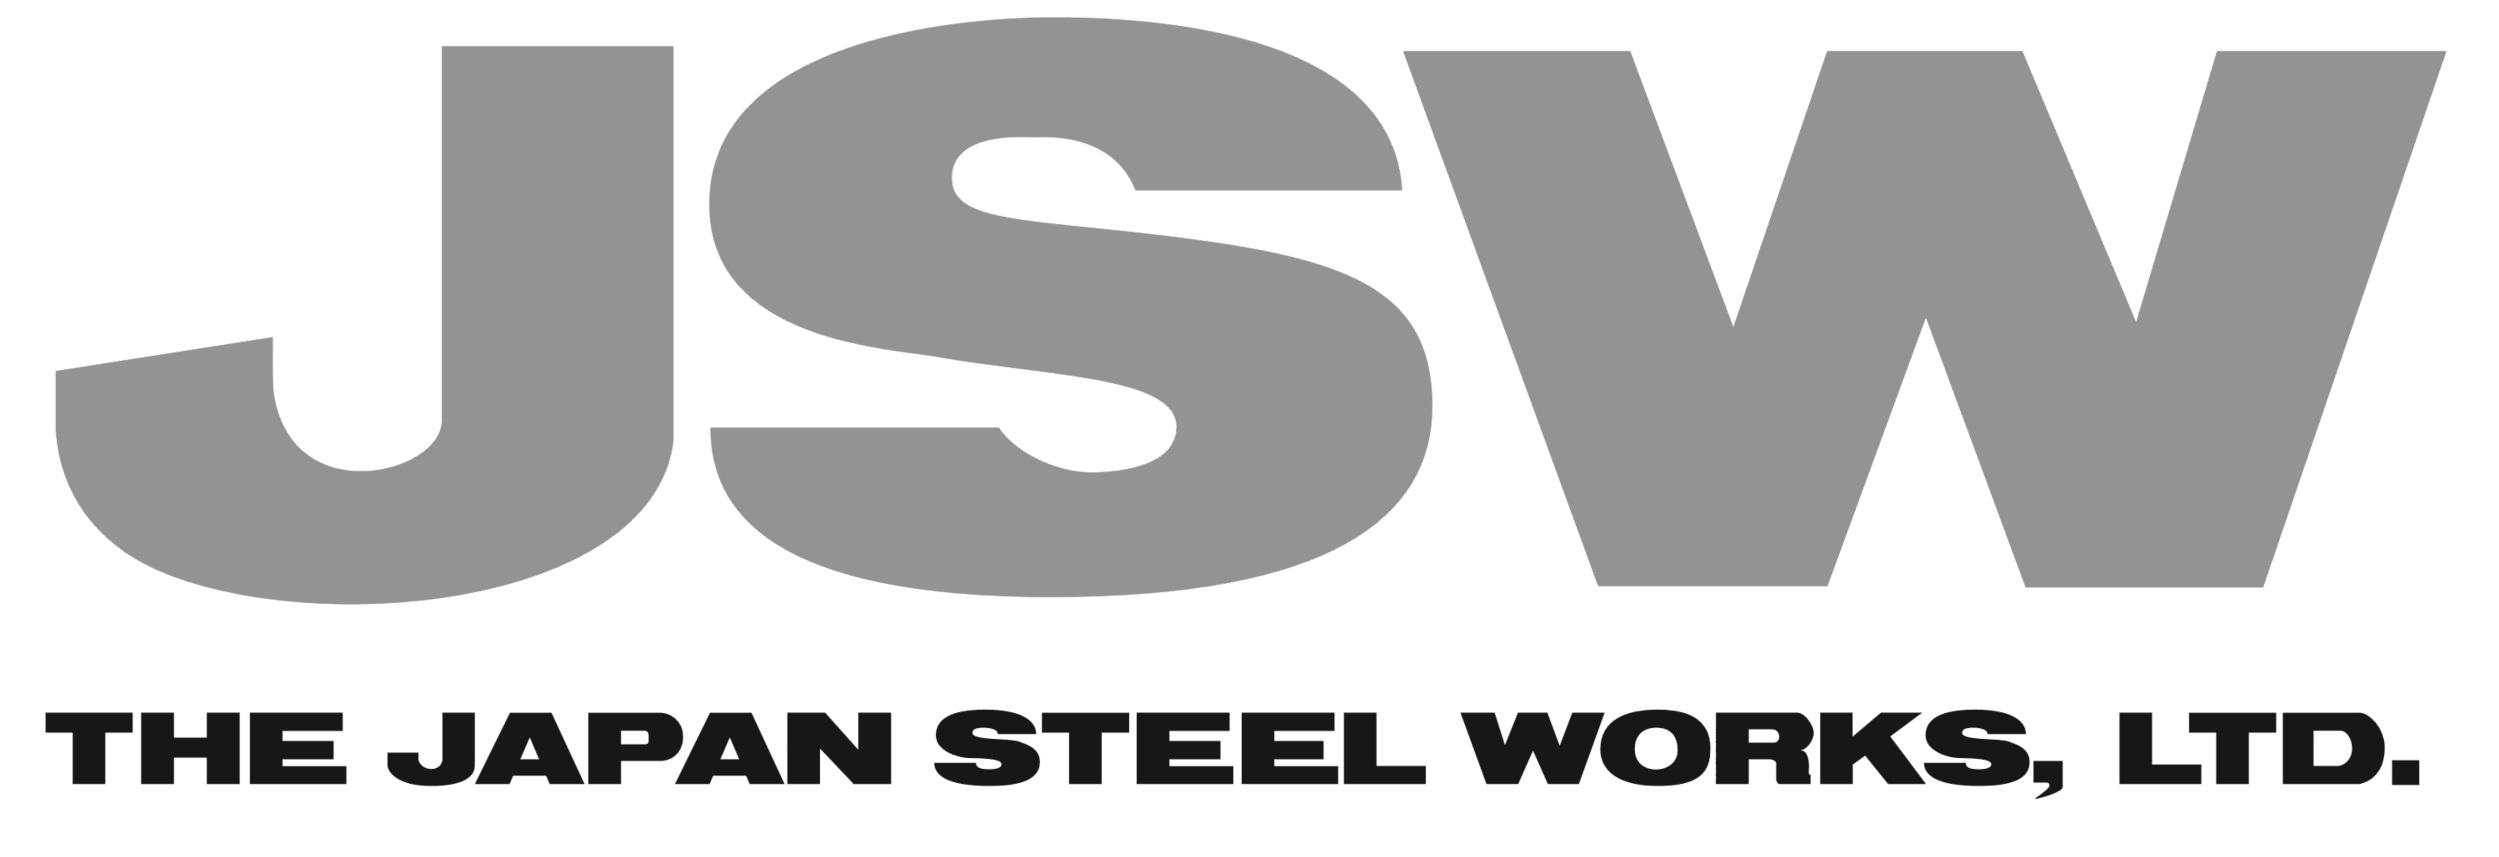 JSW_logo_1.jpg